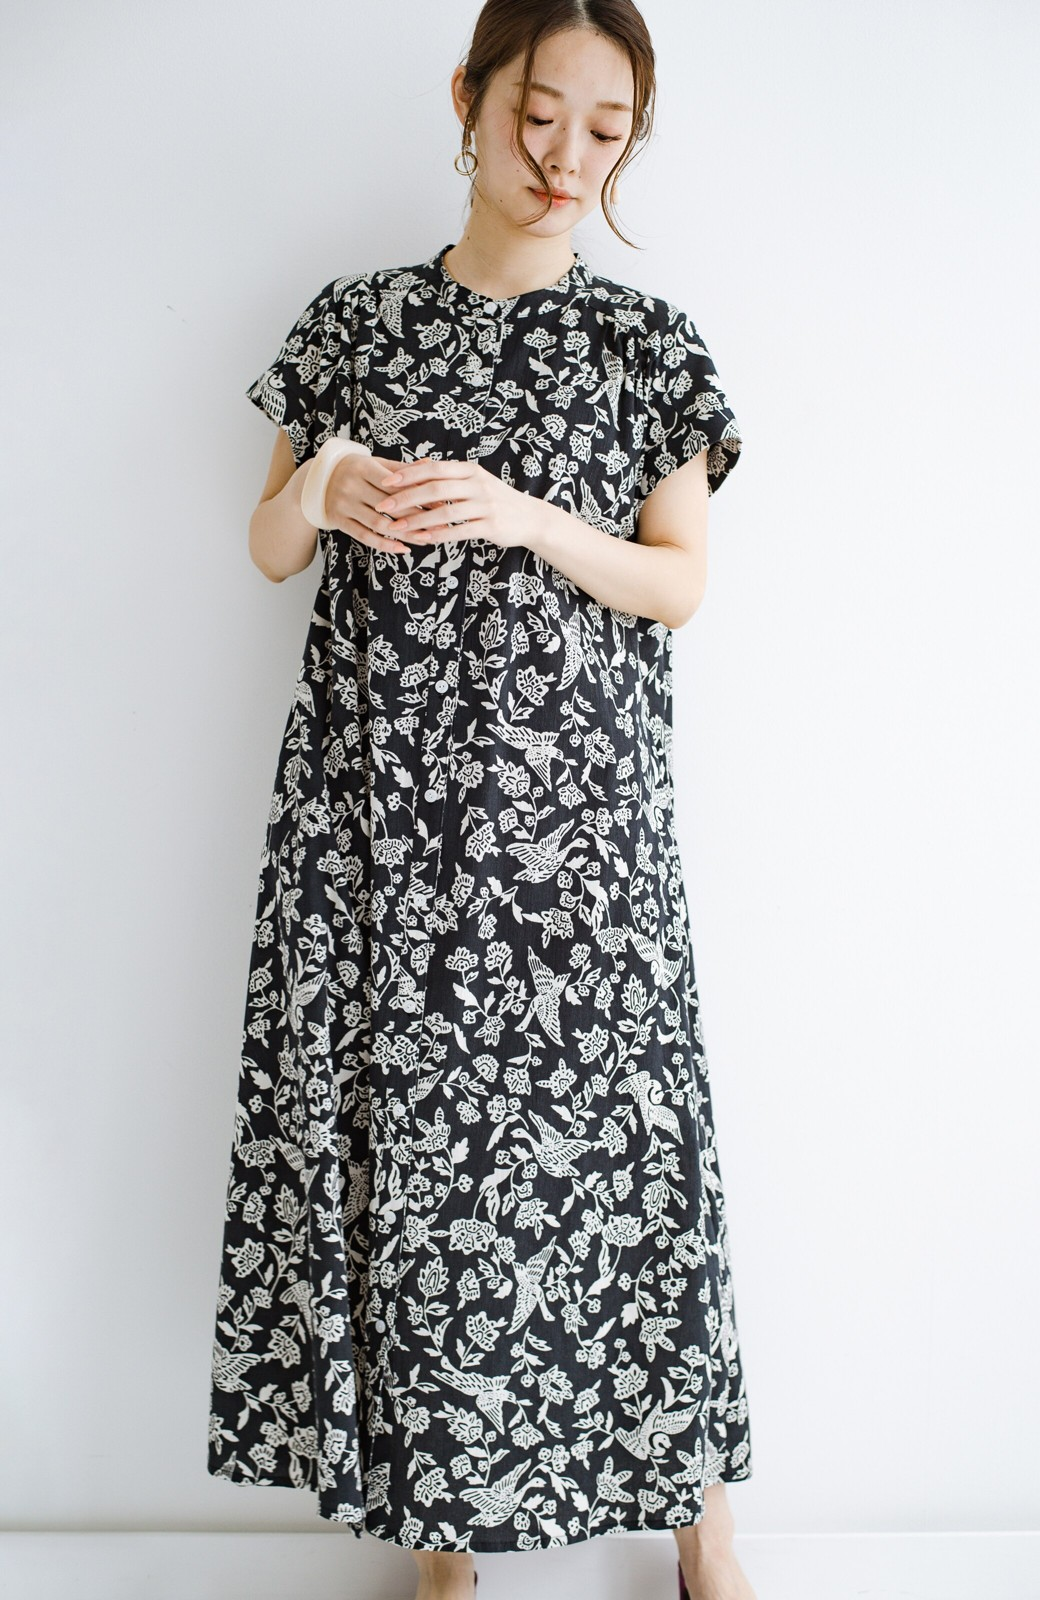 haco! 京都の浴衣屋さんと作った浴衣生地の羽織ってもかわいいロングワンピース <ブラック系その他>の商品写真21